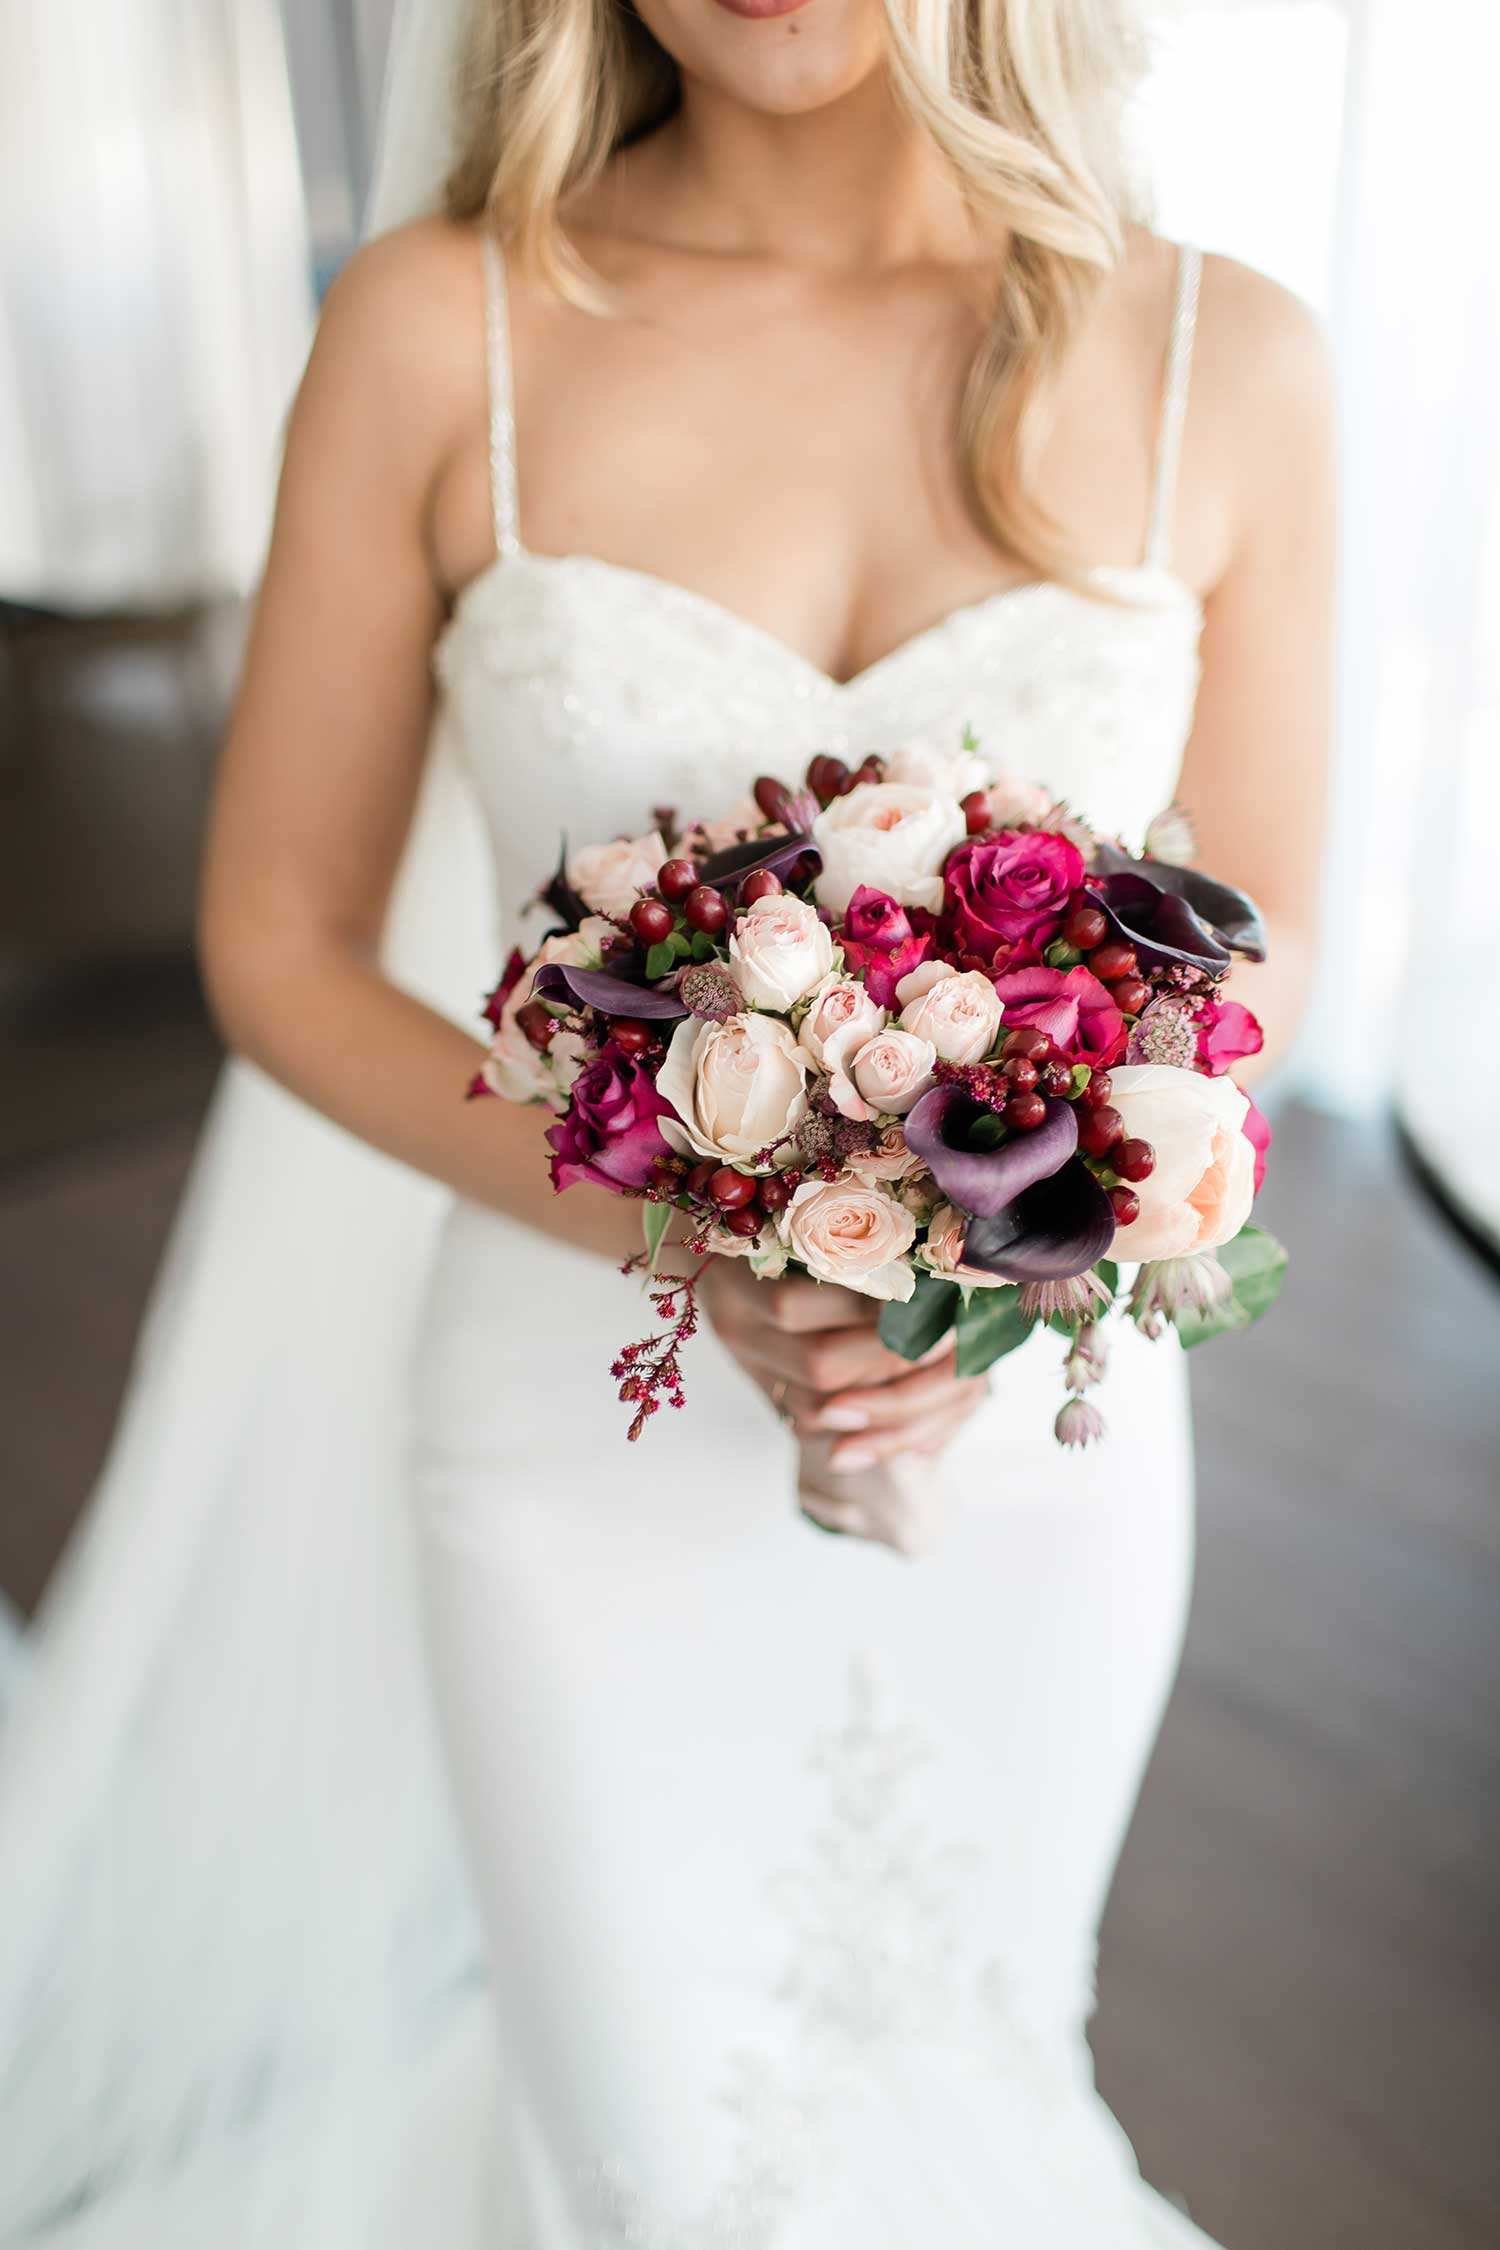 Beautiful wedding flower bouquet